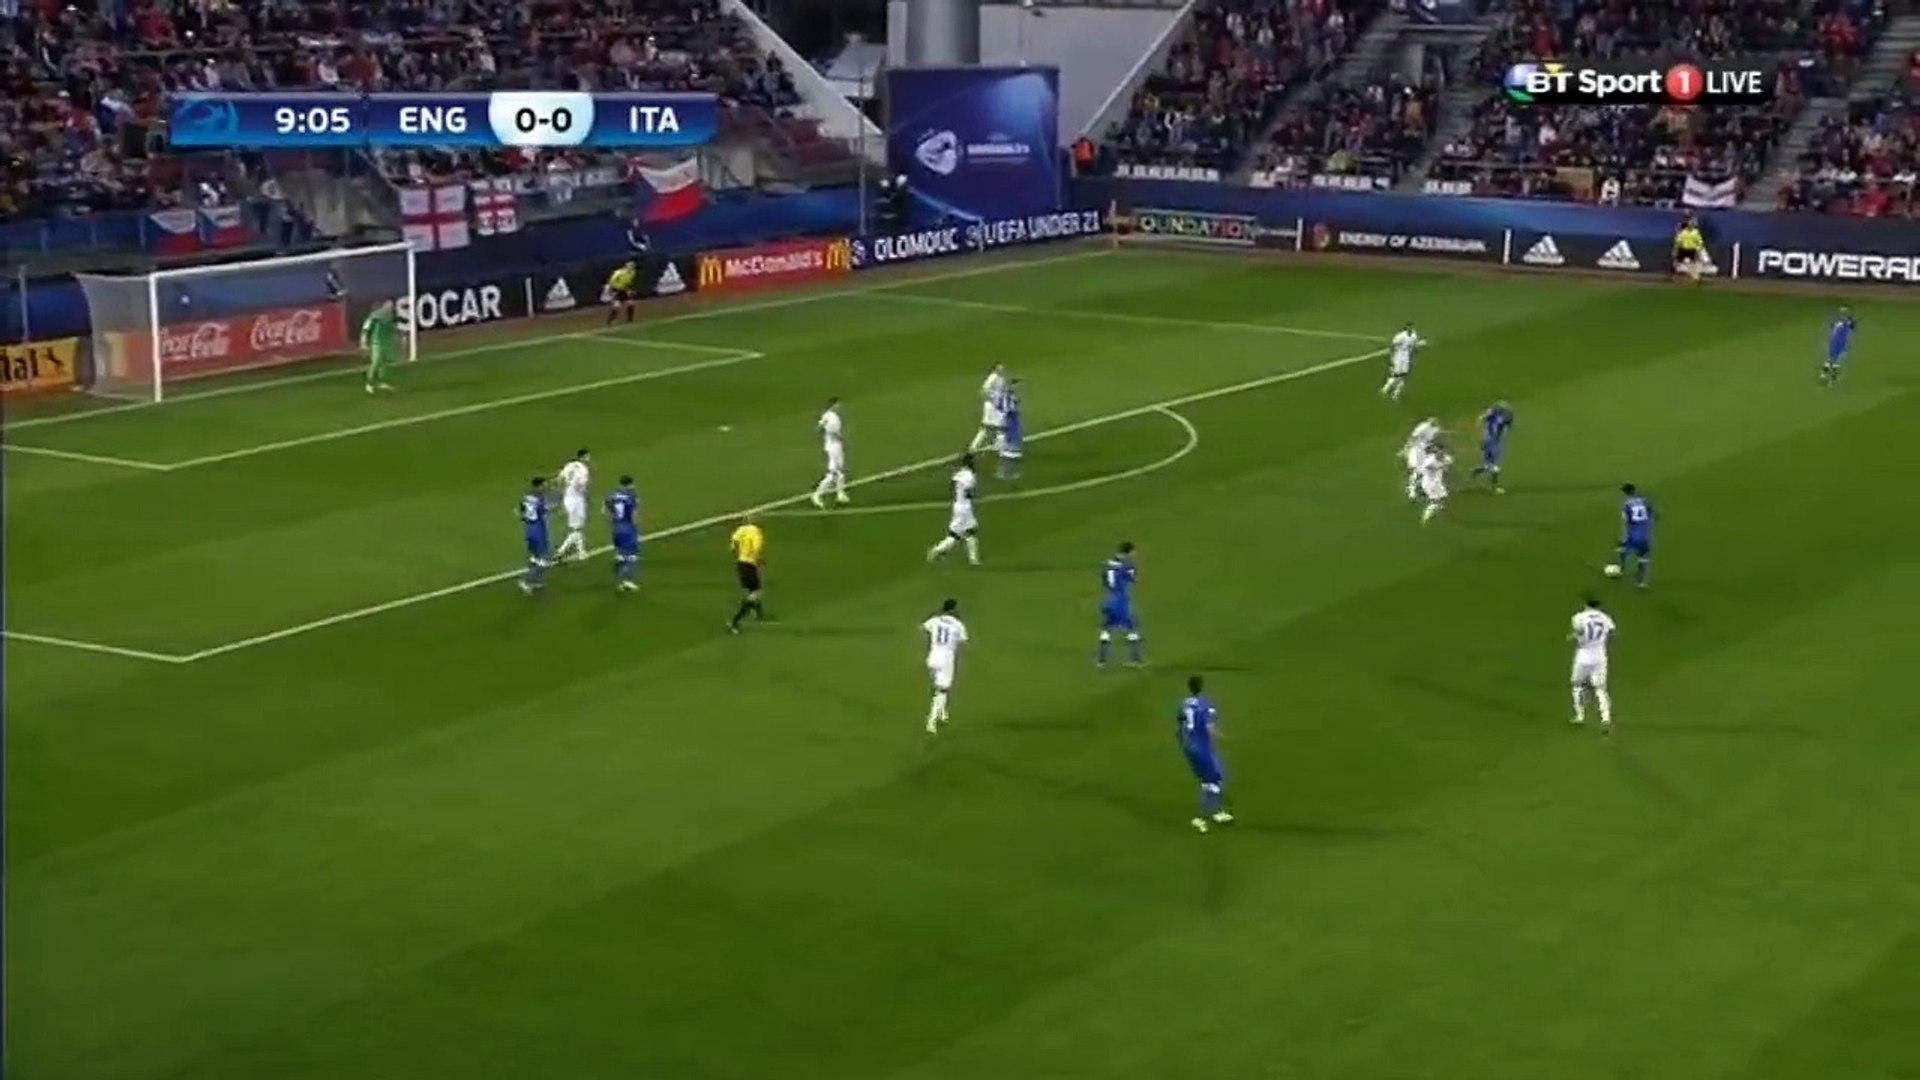 Domenico Berardi Fantastic Long Shot - England v. Italy 24.06.2015